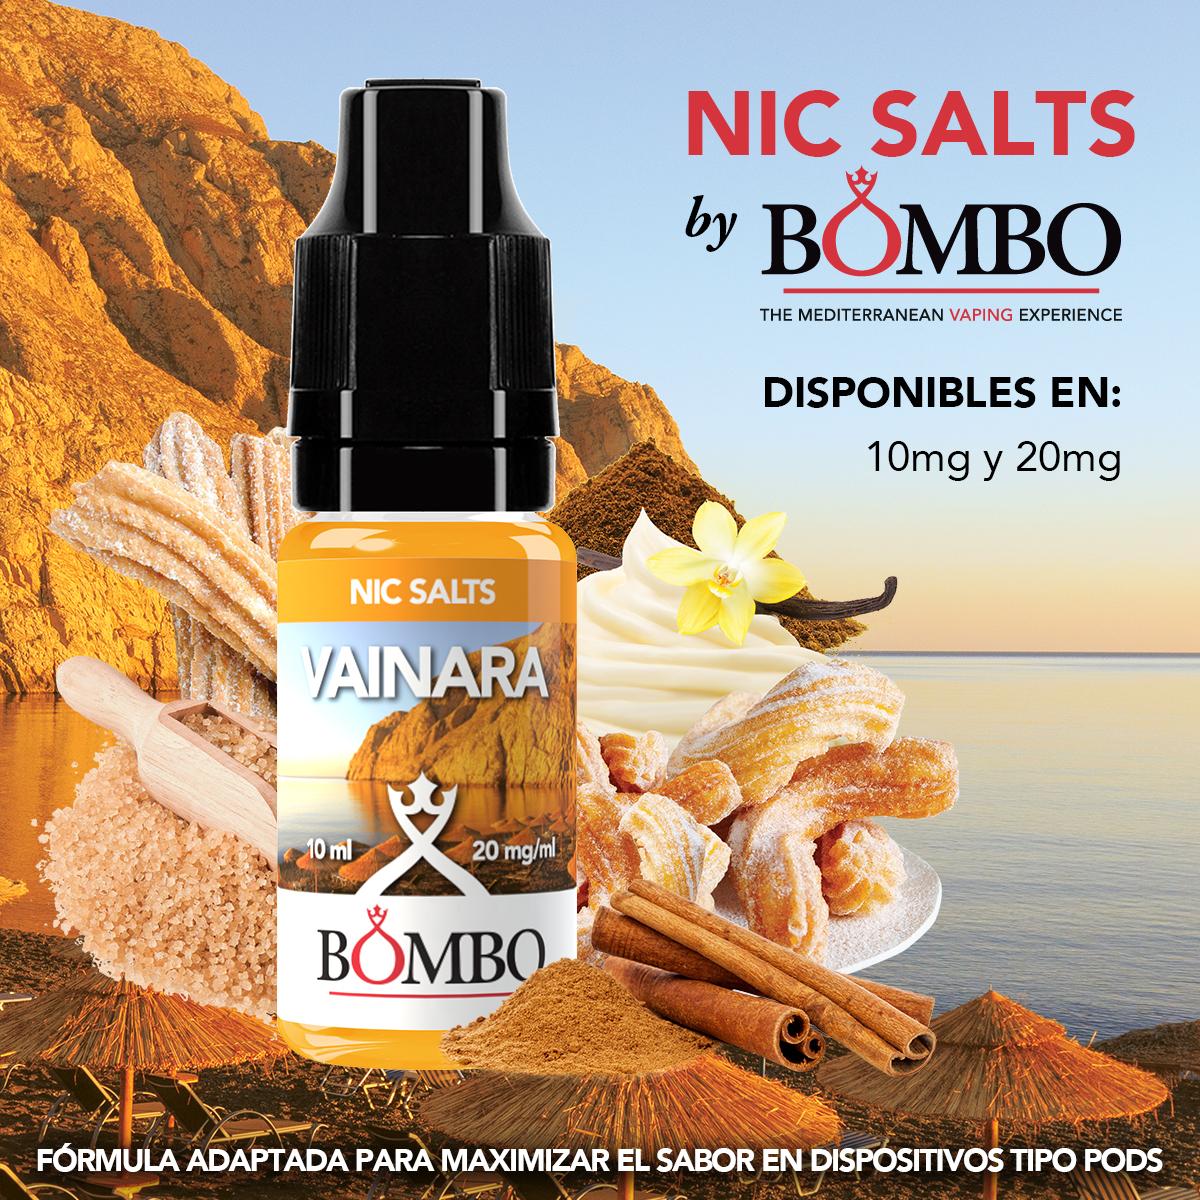 vainara bombo eliquids nic salts sales de nicotina